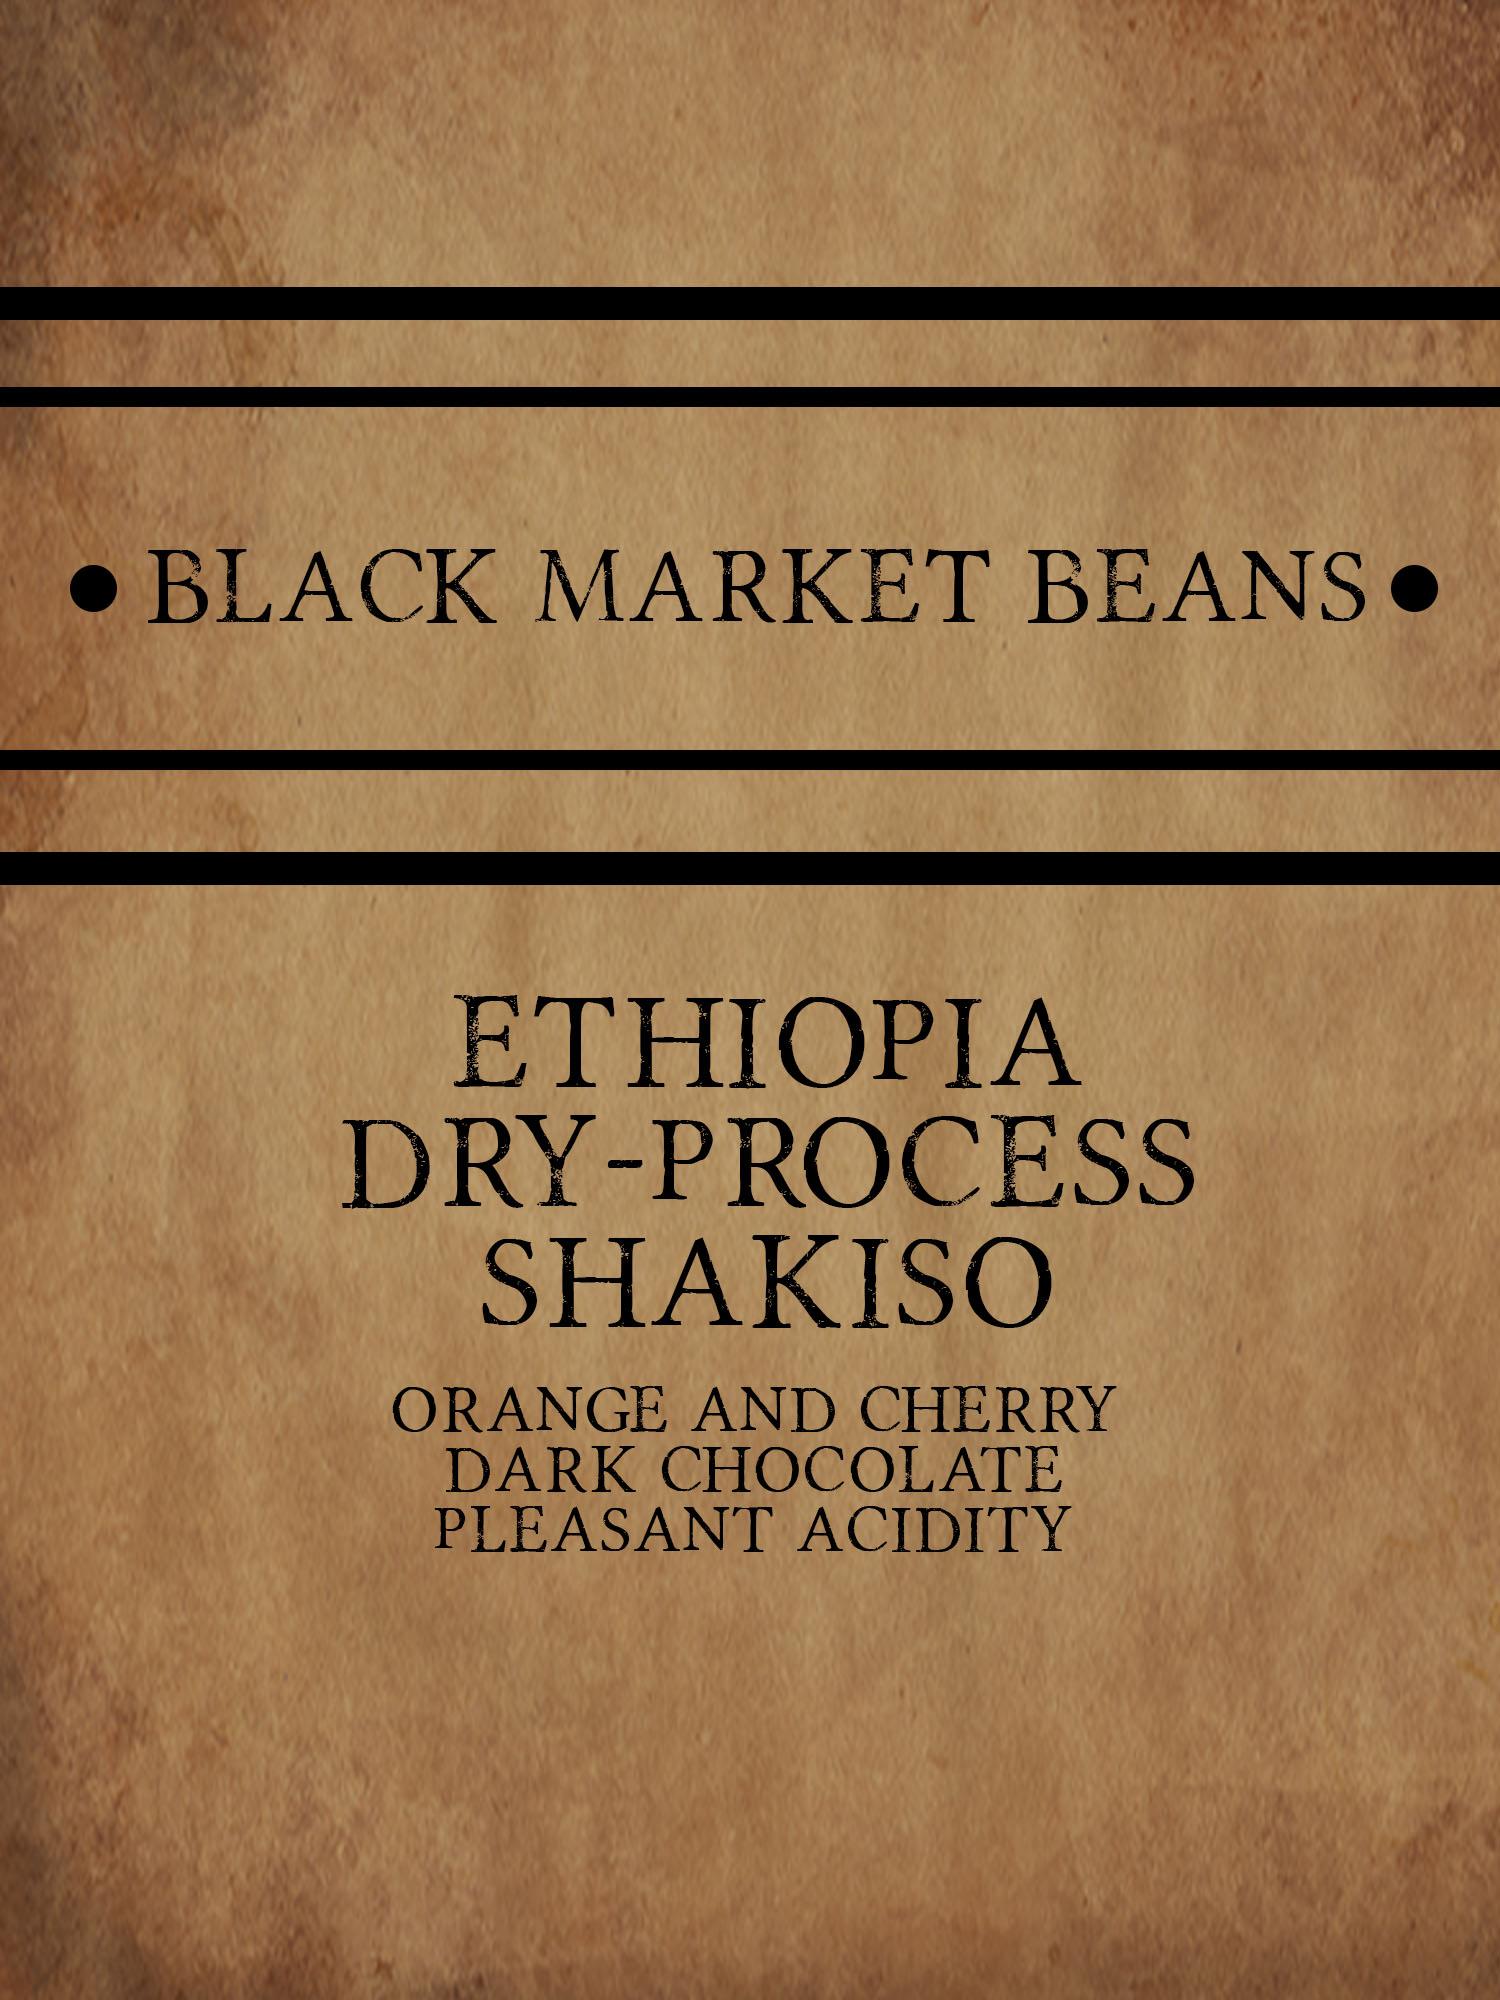 coffee_Ethiopia_Shakiso_dry_process.jpg